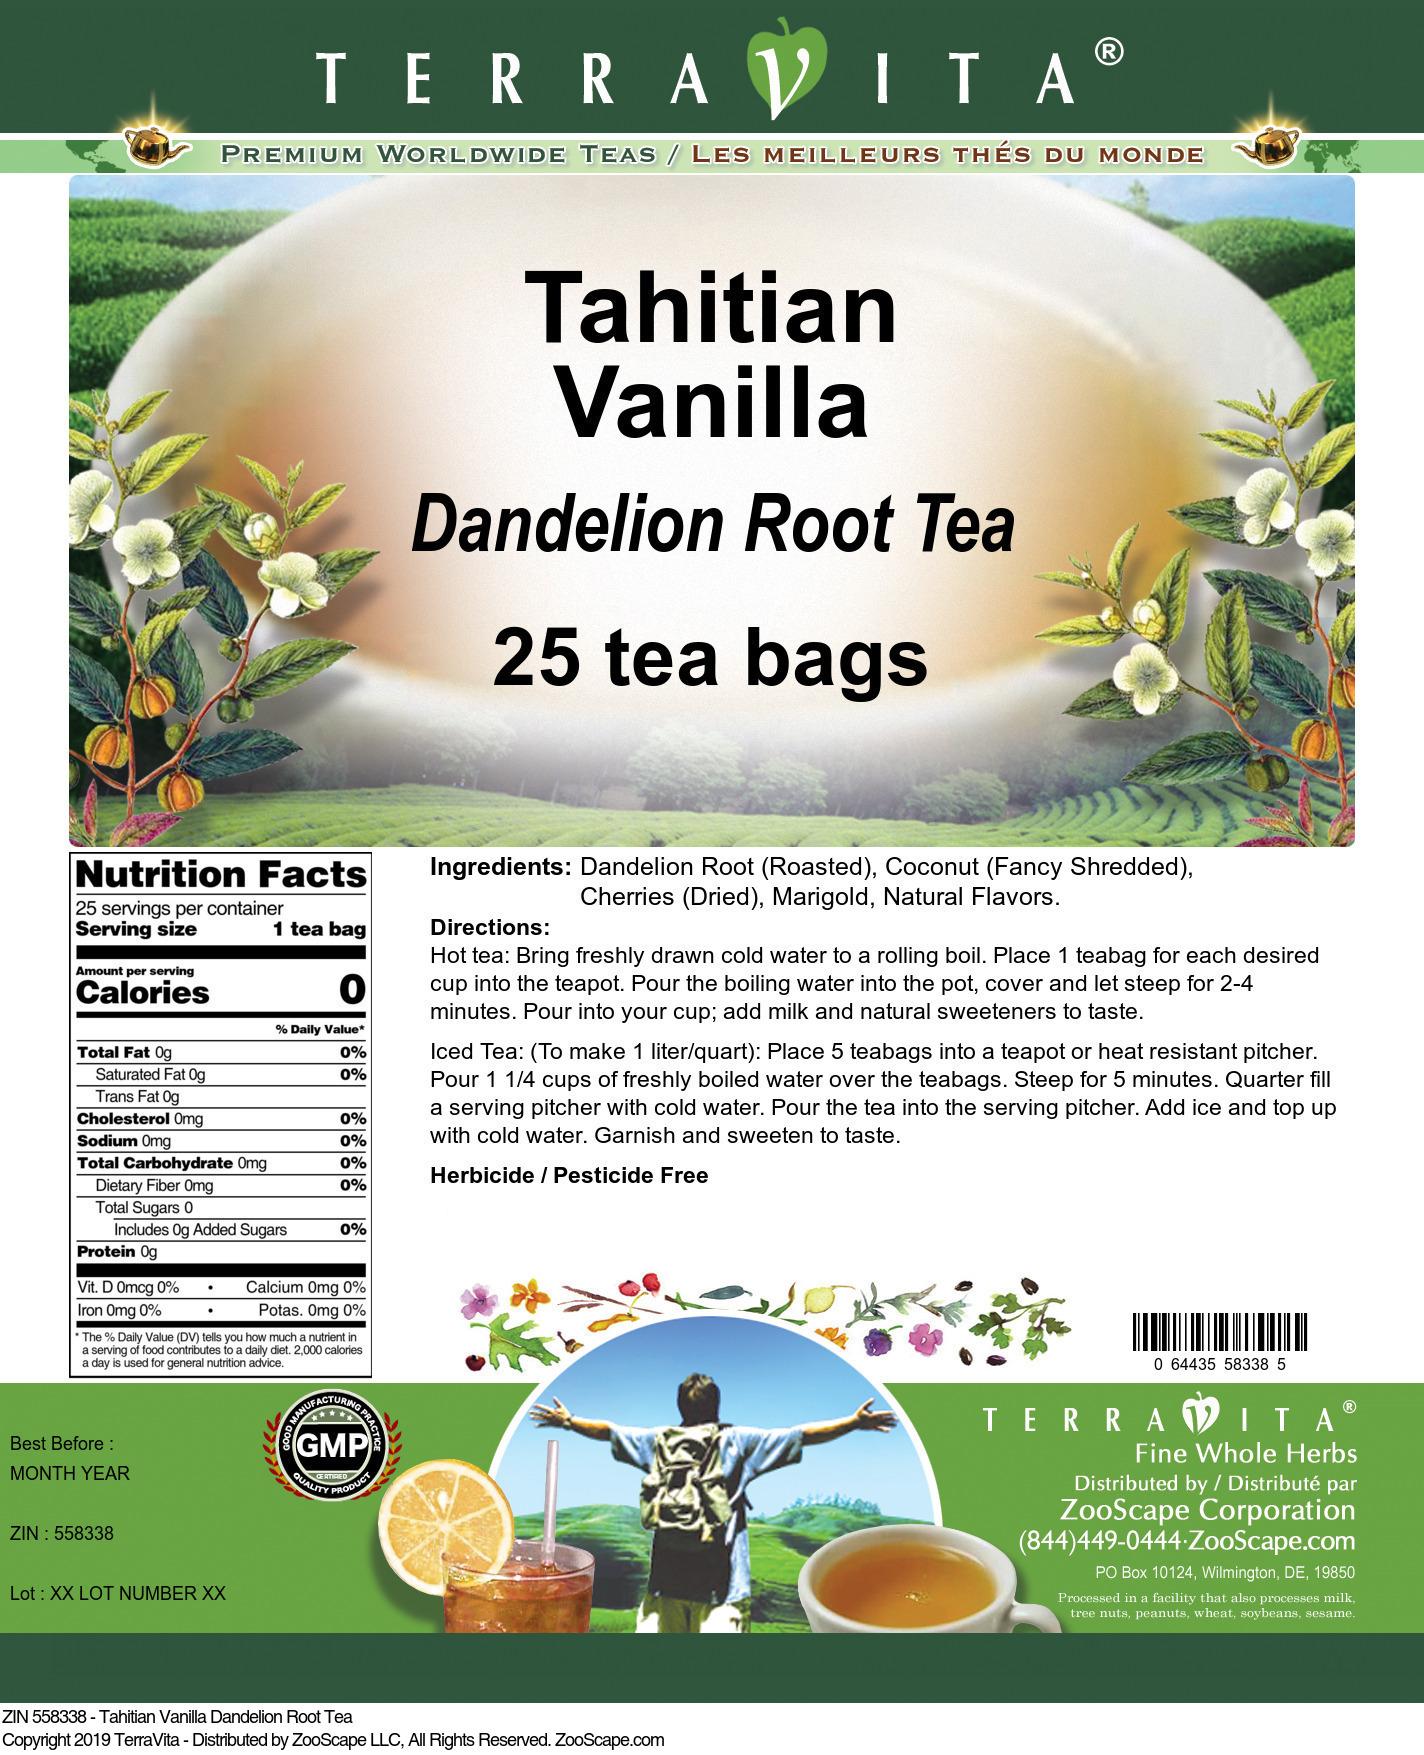 Tahitian Vanilla Dandelion Root Tea